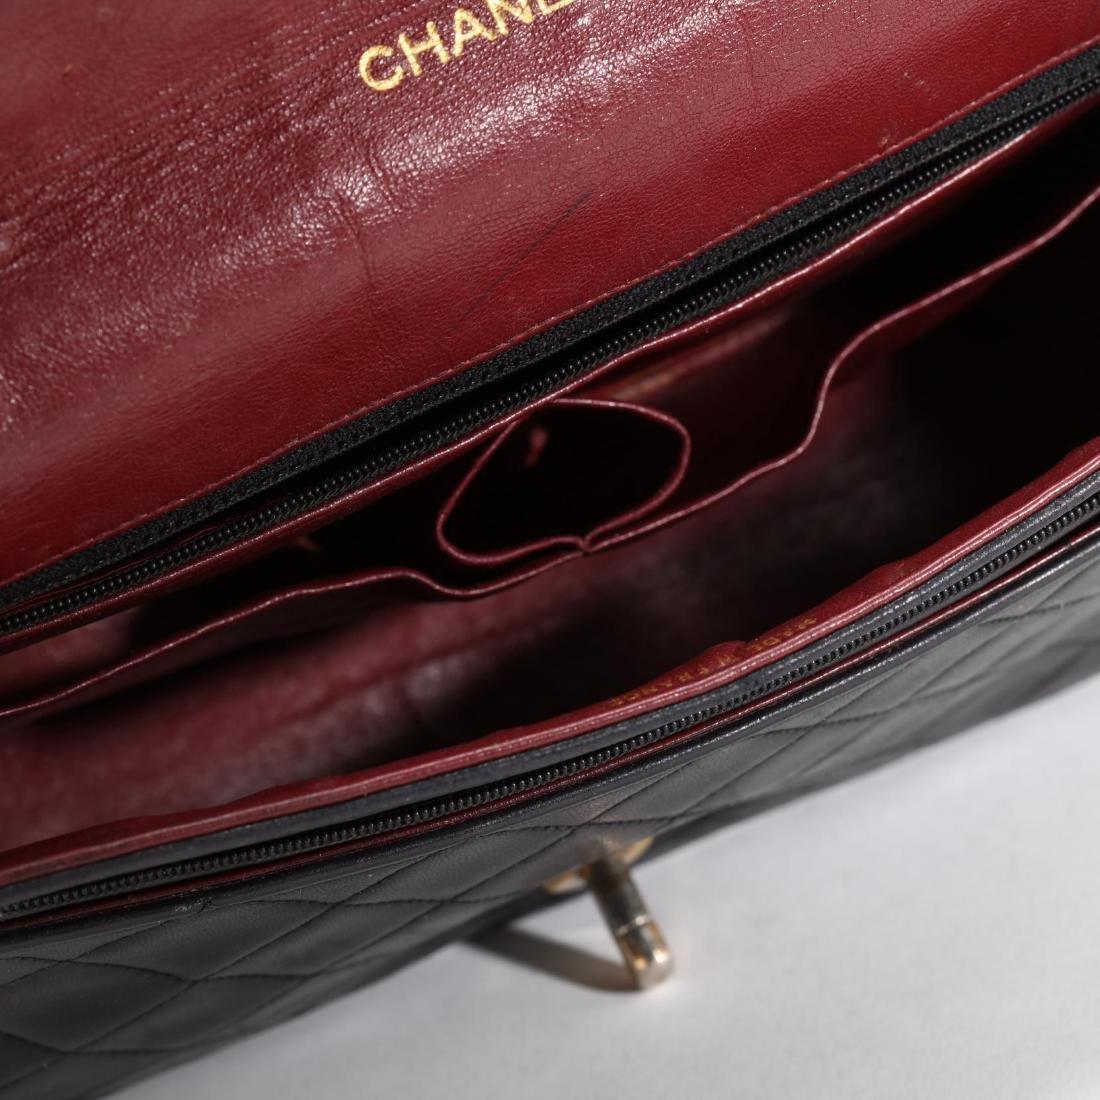 Vintage Full Flap Crossbody Bag, Chanel - 6